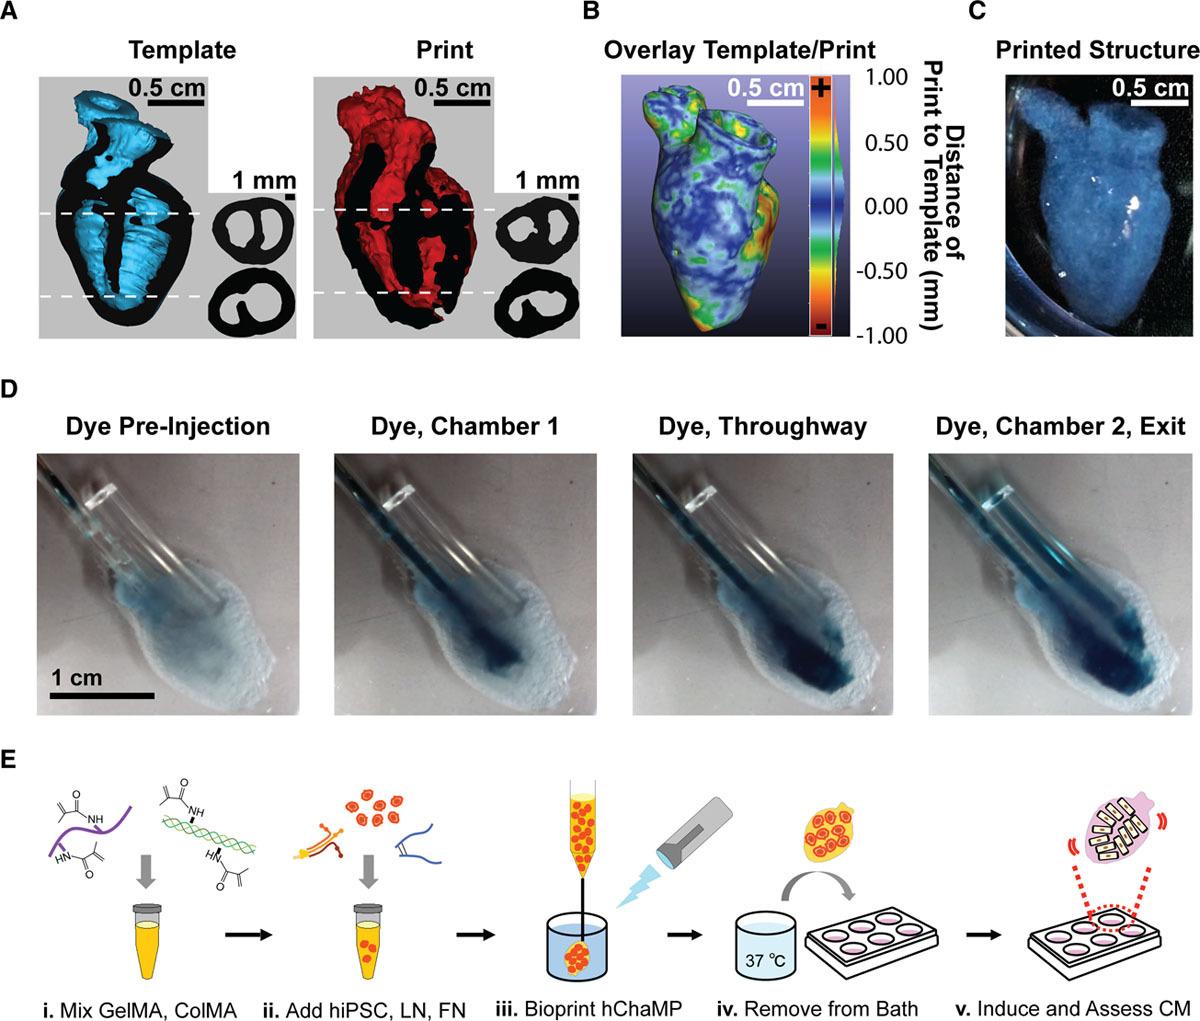 College of Minnesota researchers use 3D bioprinting to create beating human coronary heart 3